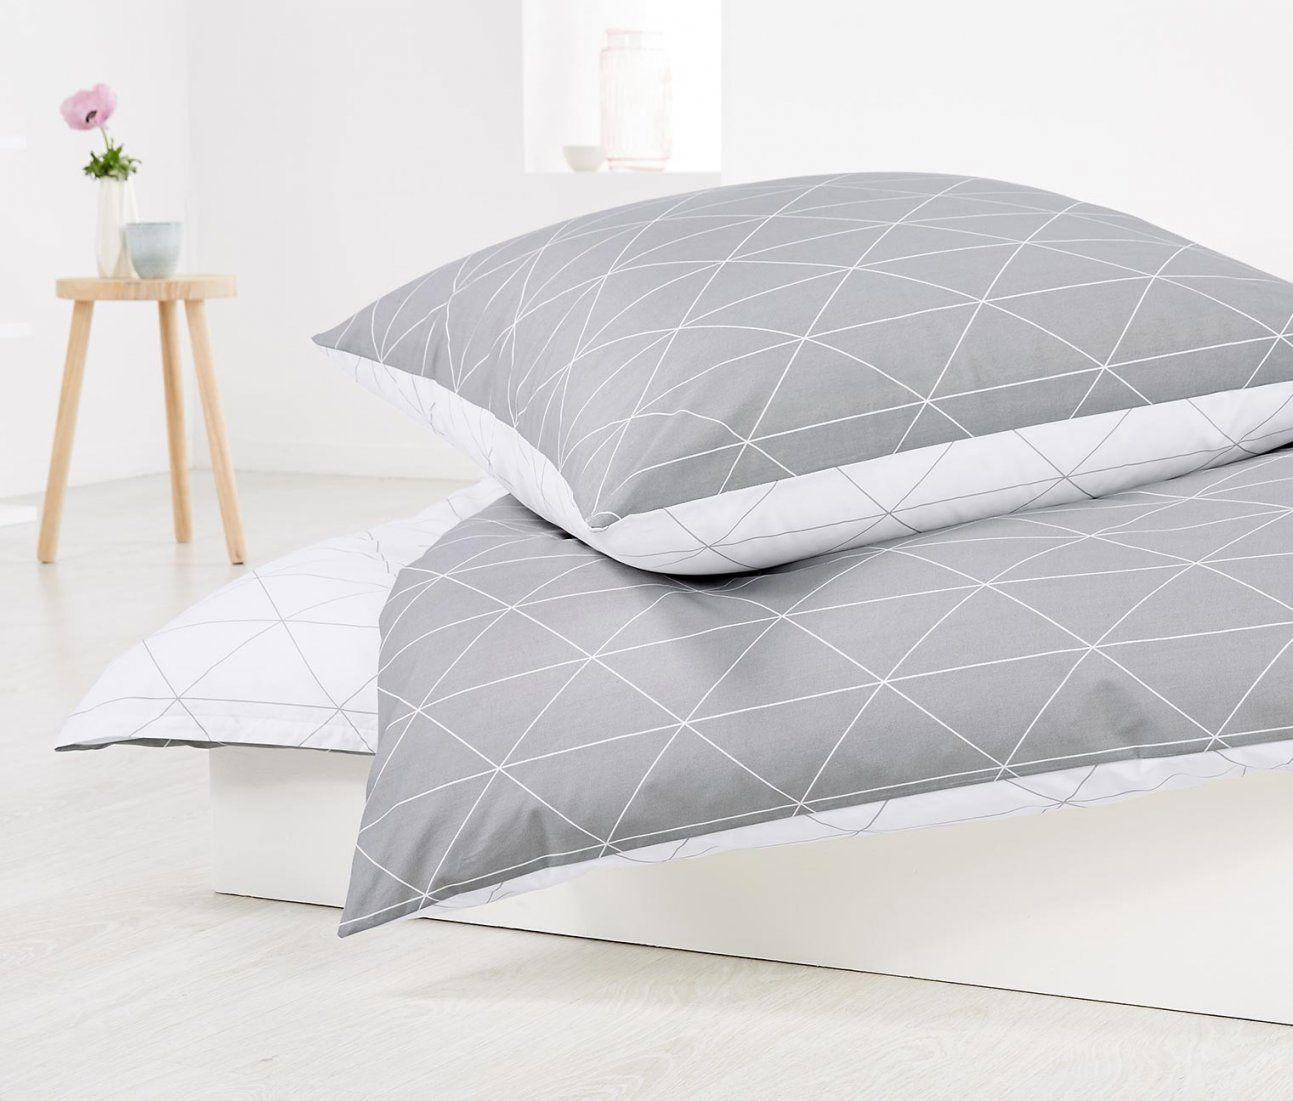 Creative Design Bettwasche Rosa Grau Gemütlich Tchibo Bettwäsche von Bettwäsche Sterne Grau 155X220 Bild